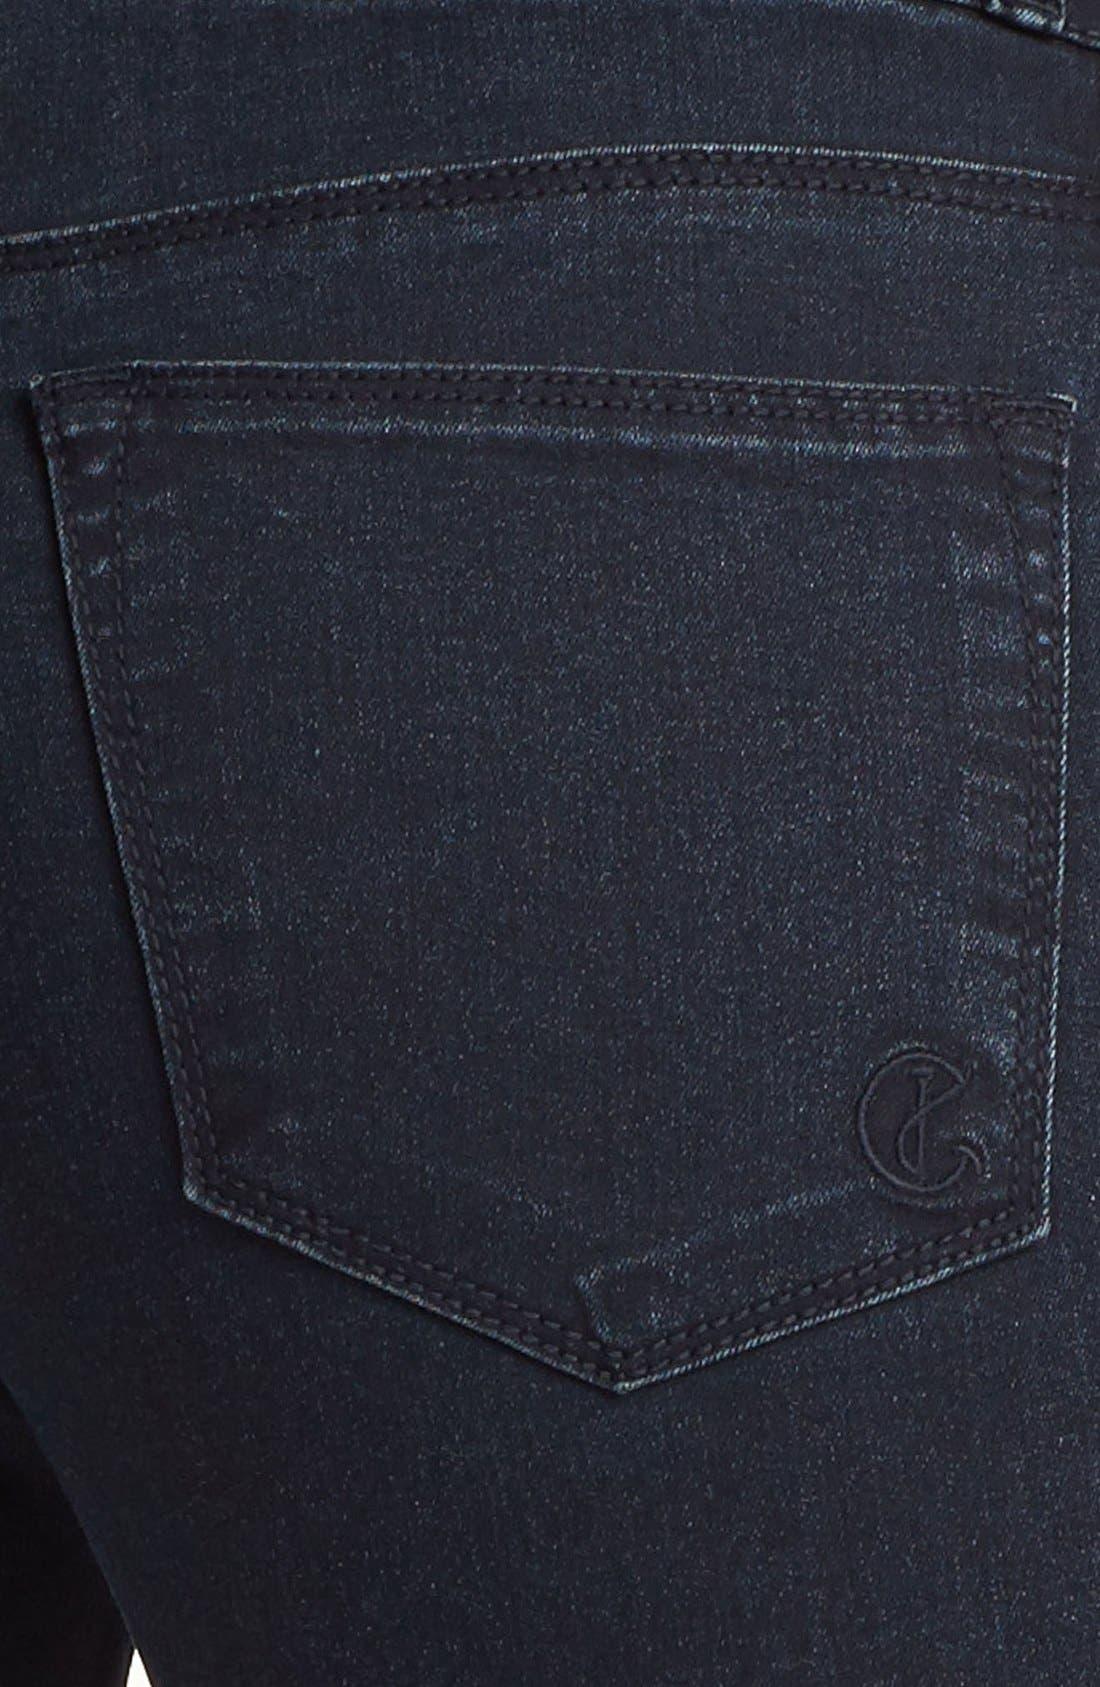 Alternate Image 3  - CJ by Cookie Johnson Track Stripe Skinny Jeans